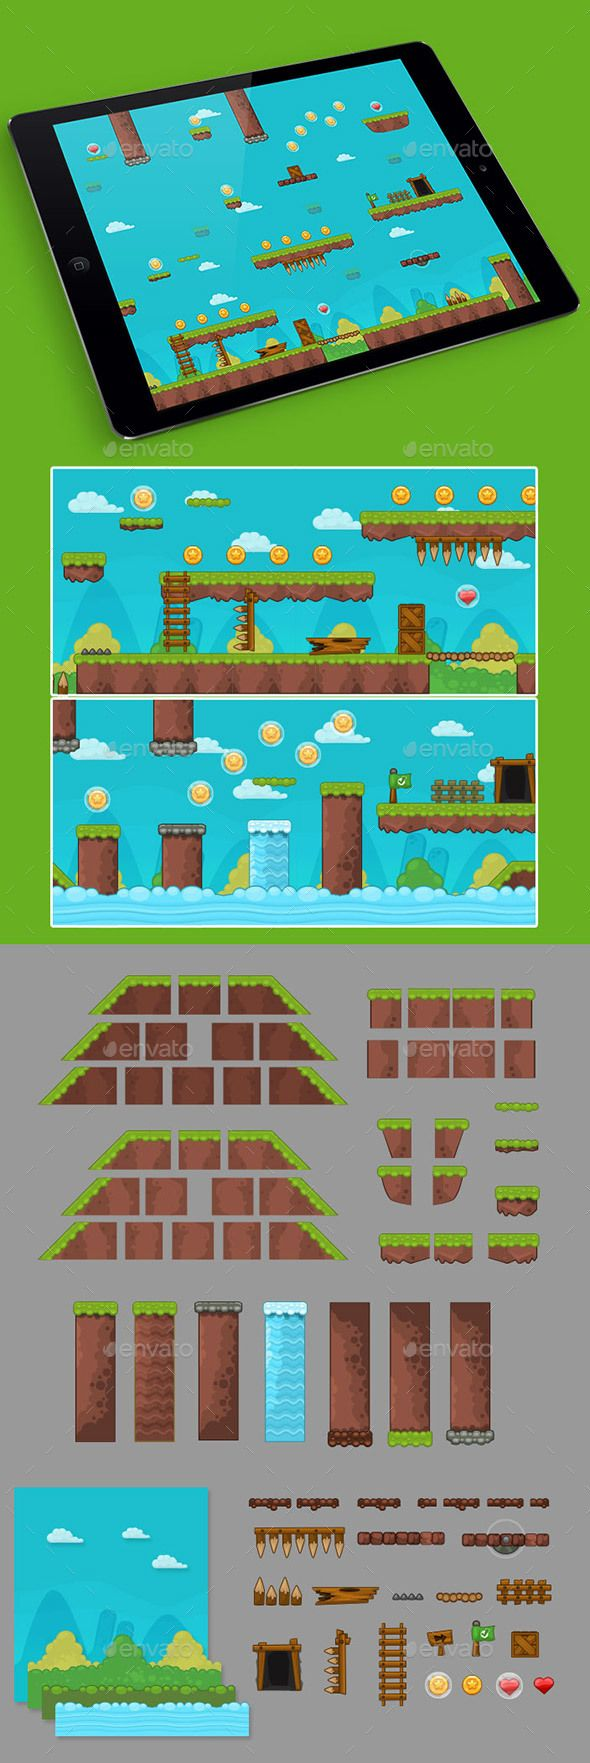 2D Grass Game Platformer Tilesets — Vector EPS #landscape #mobile • Available here → https://graphicriver.net/item/2d-grass-game-platformer-tilesets-/15591775?ref=pxcr